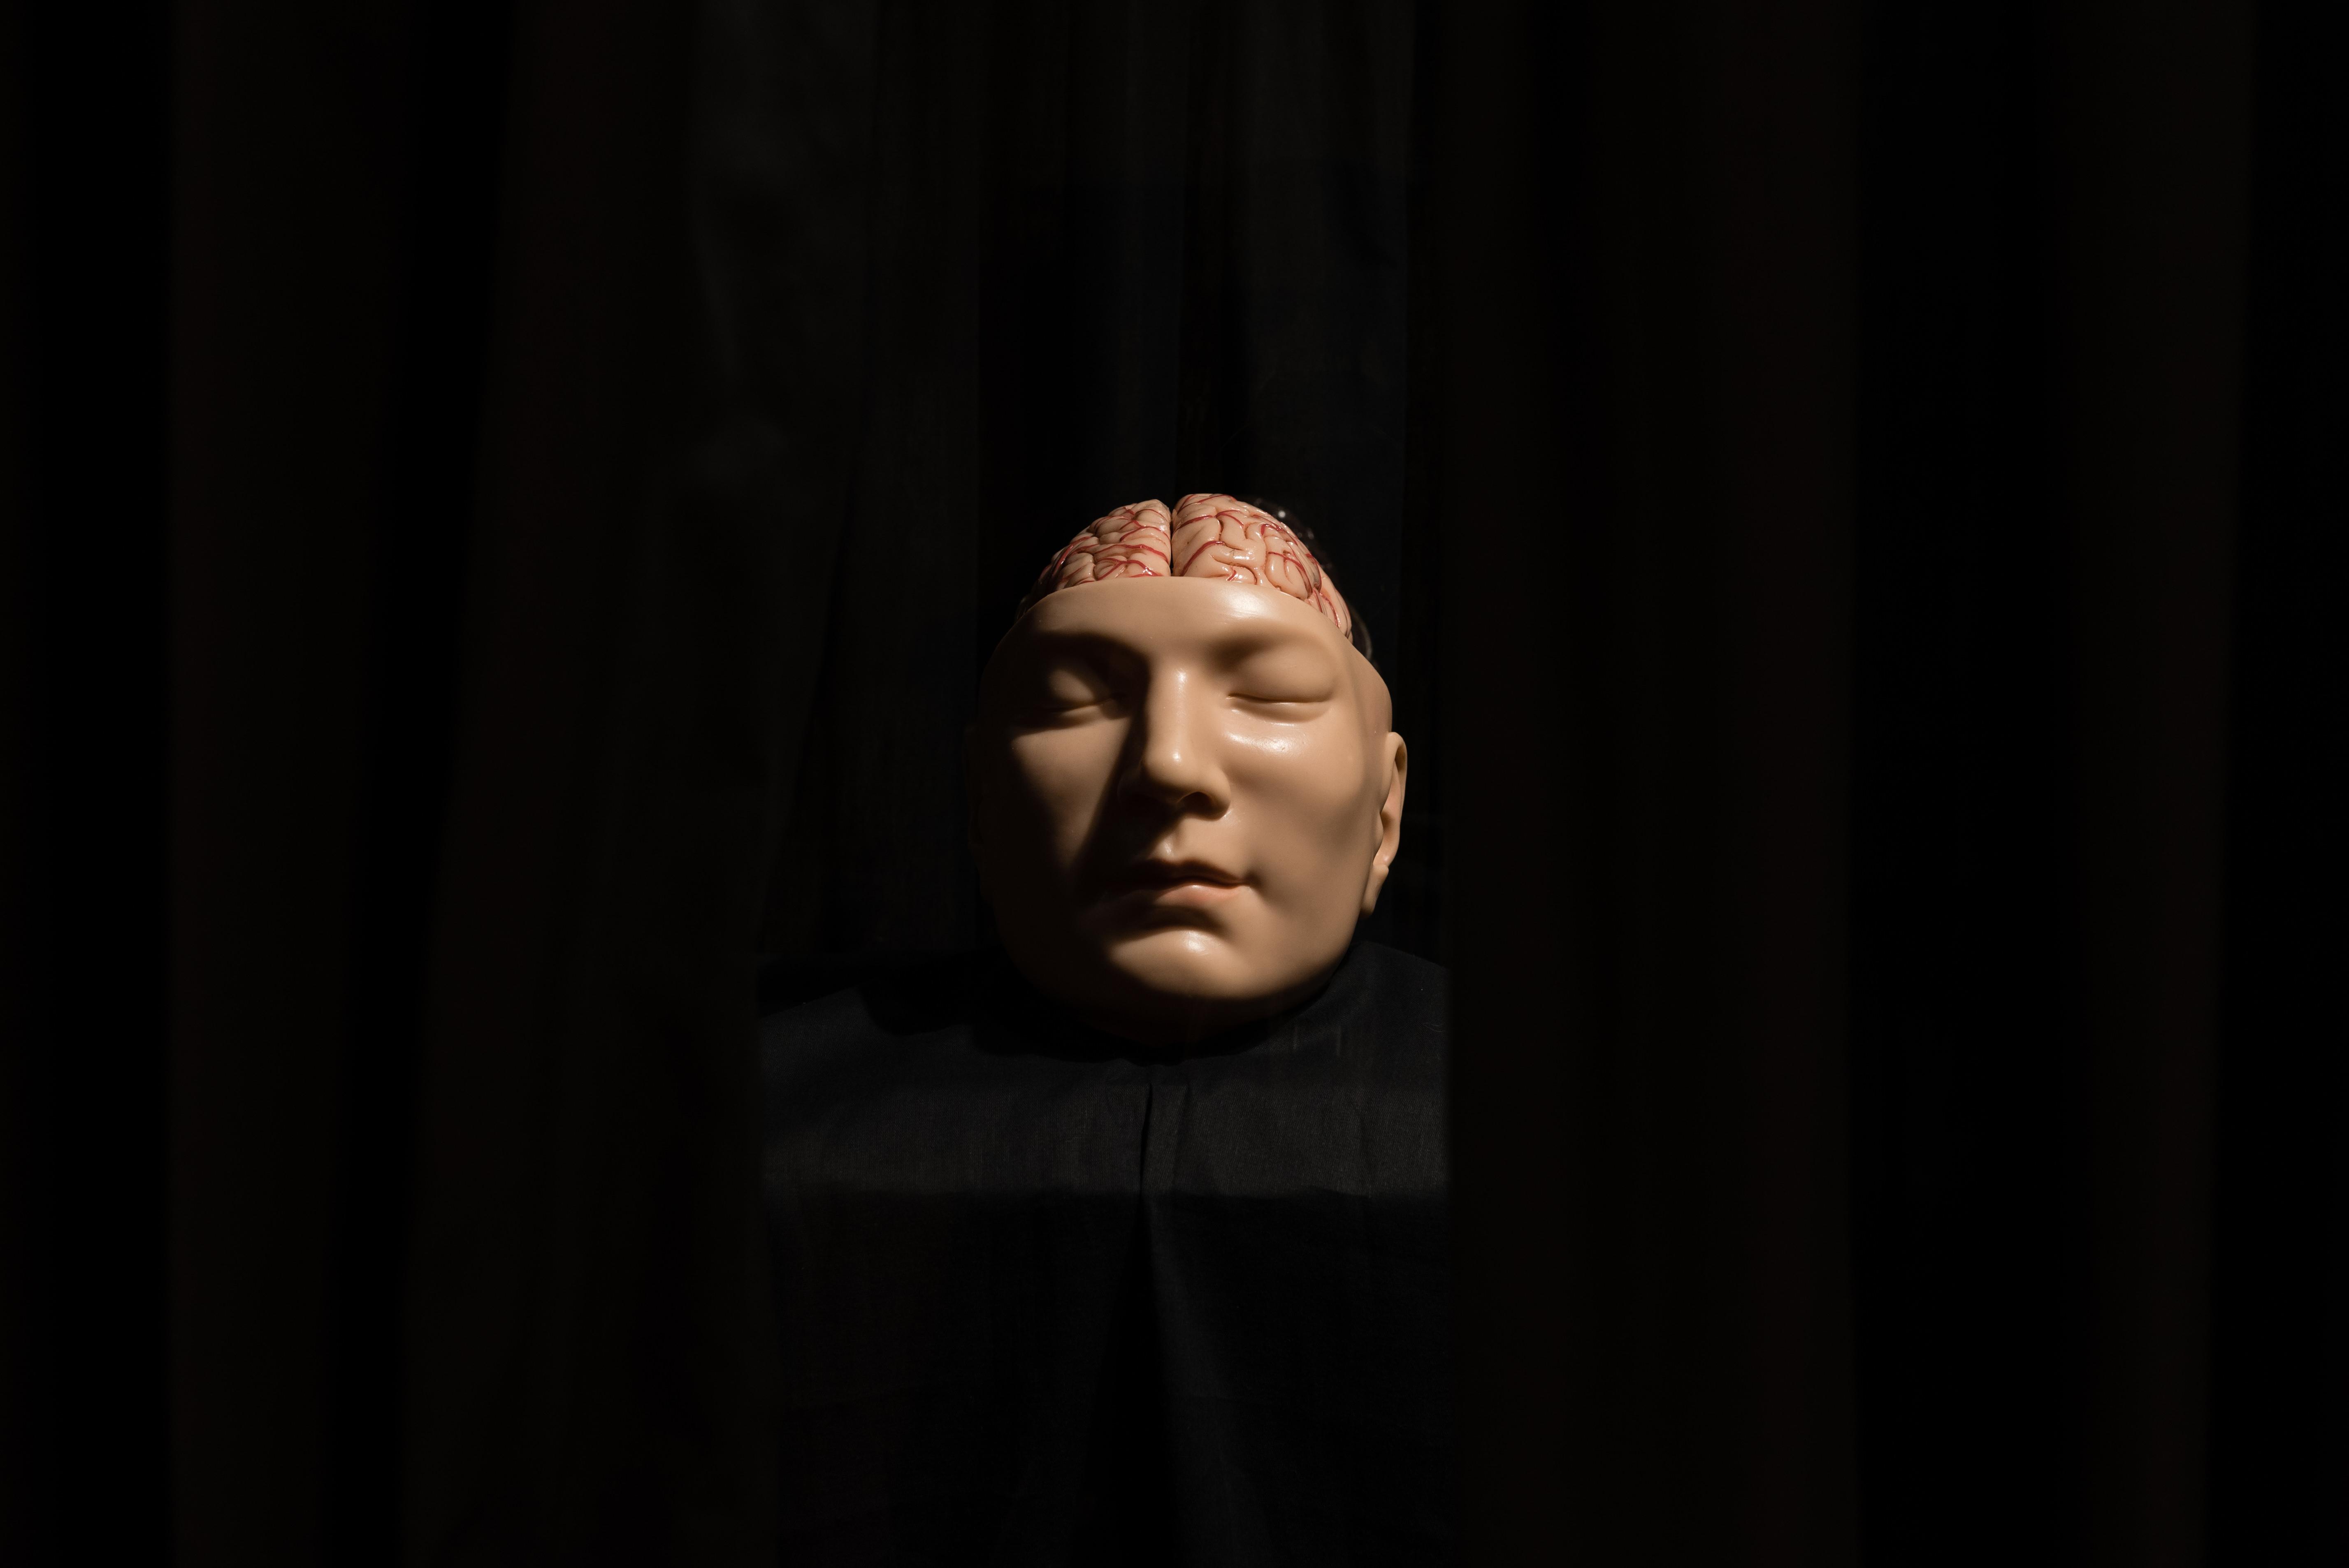 Deathmask_Brain_01